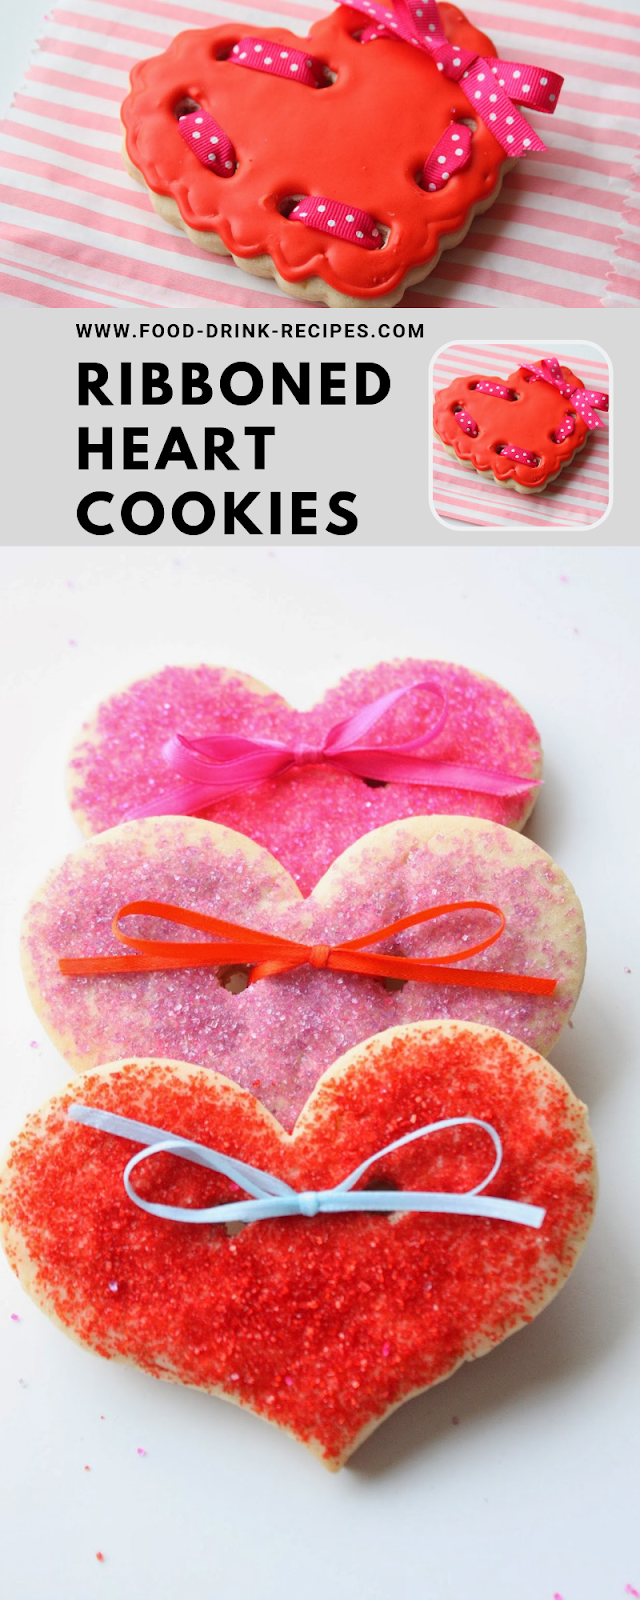 Ribboned Heart Cookies